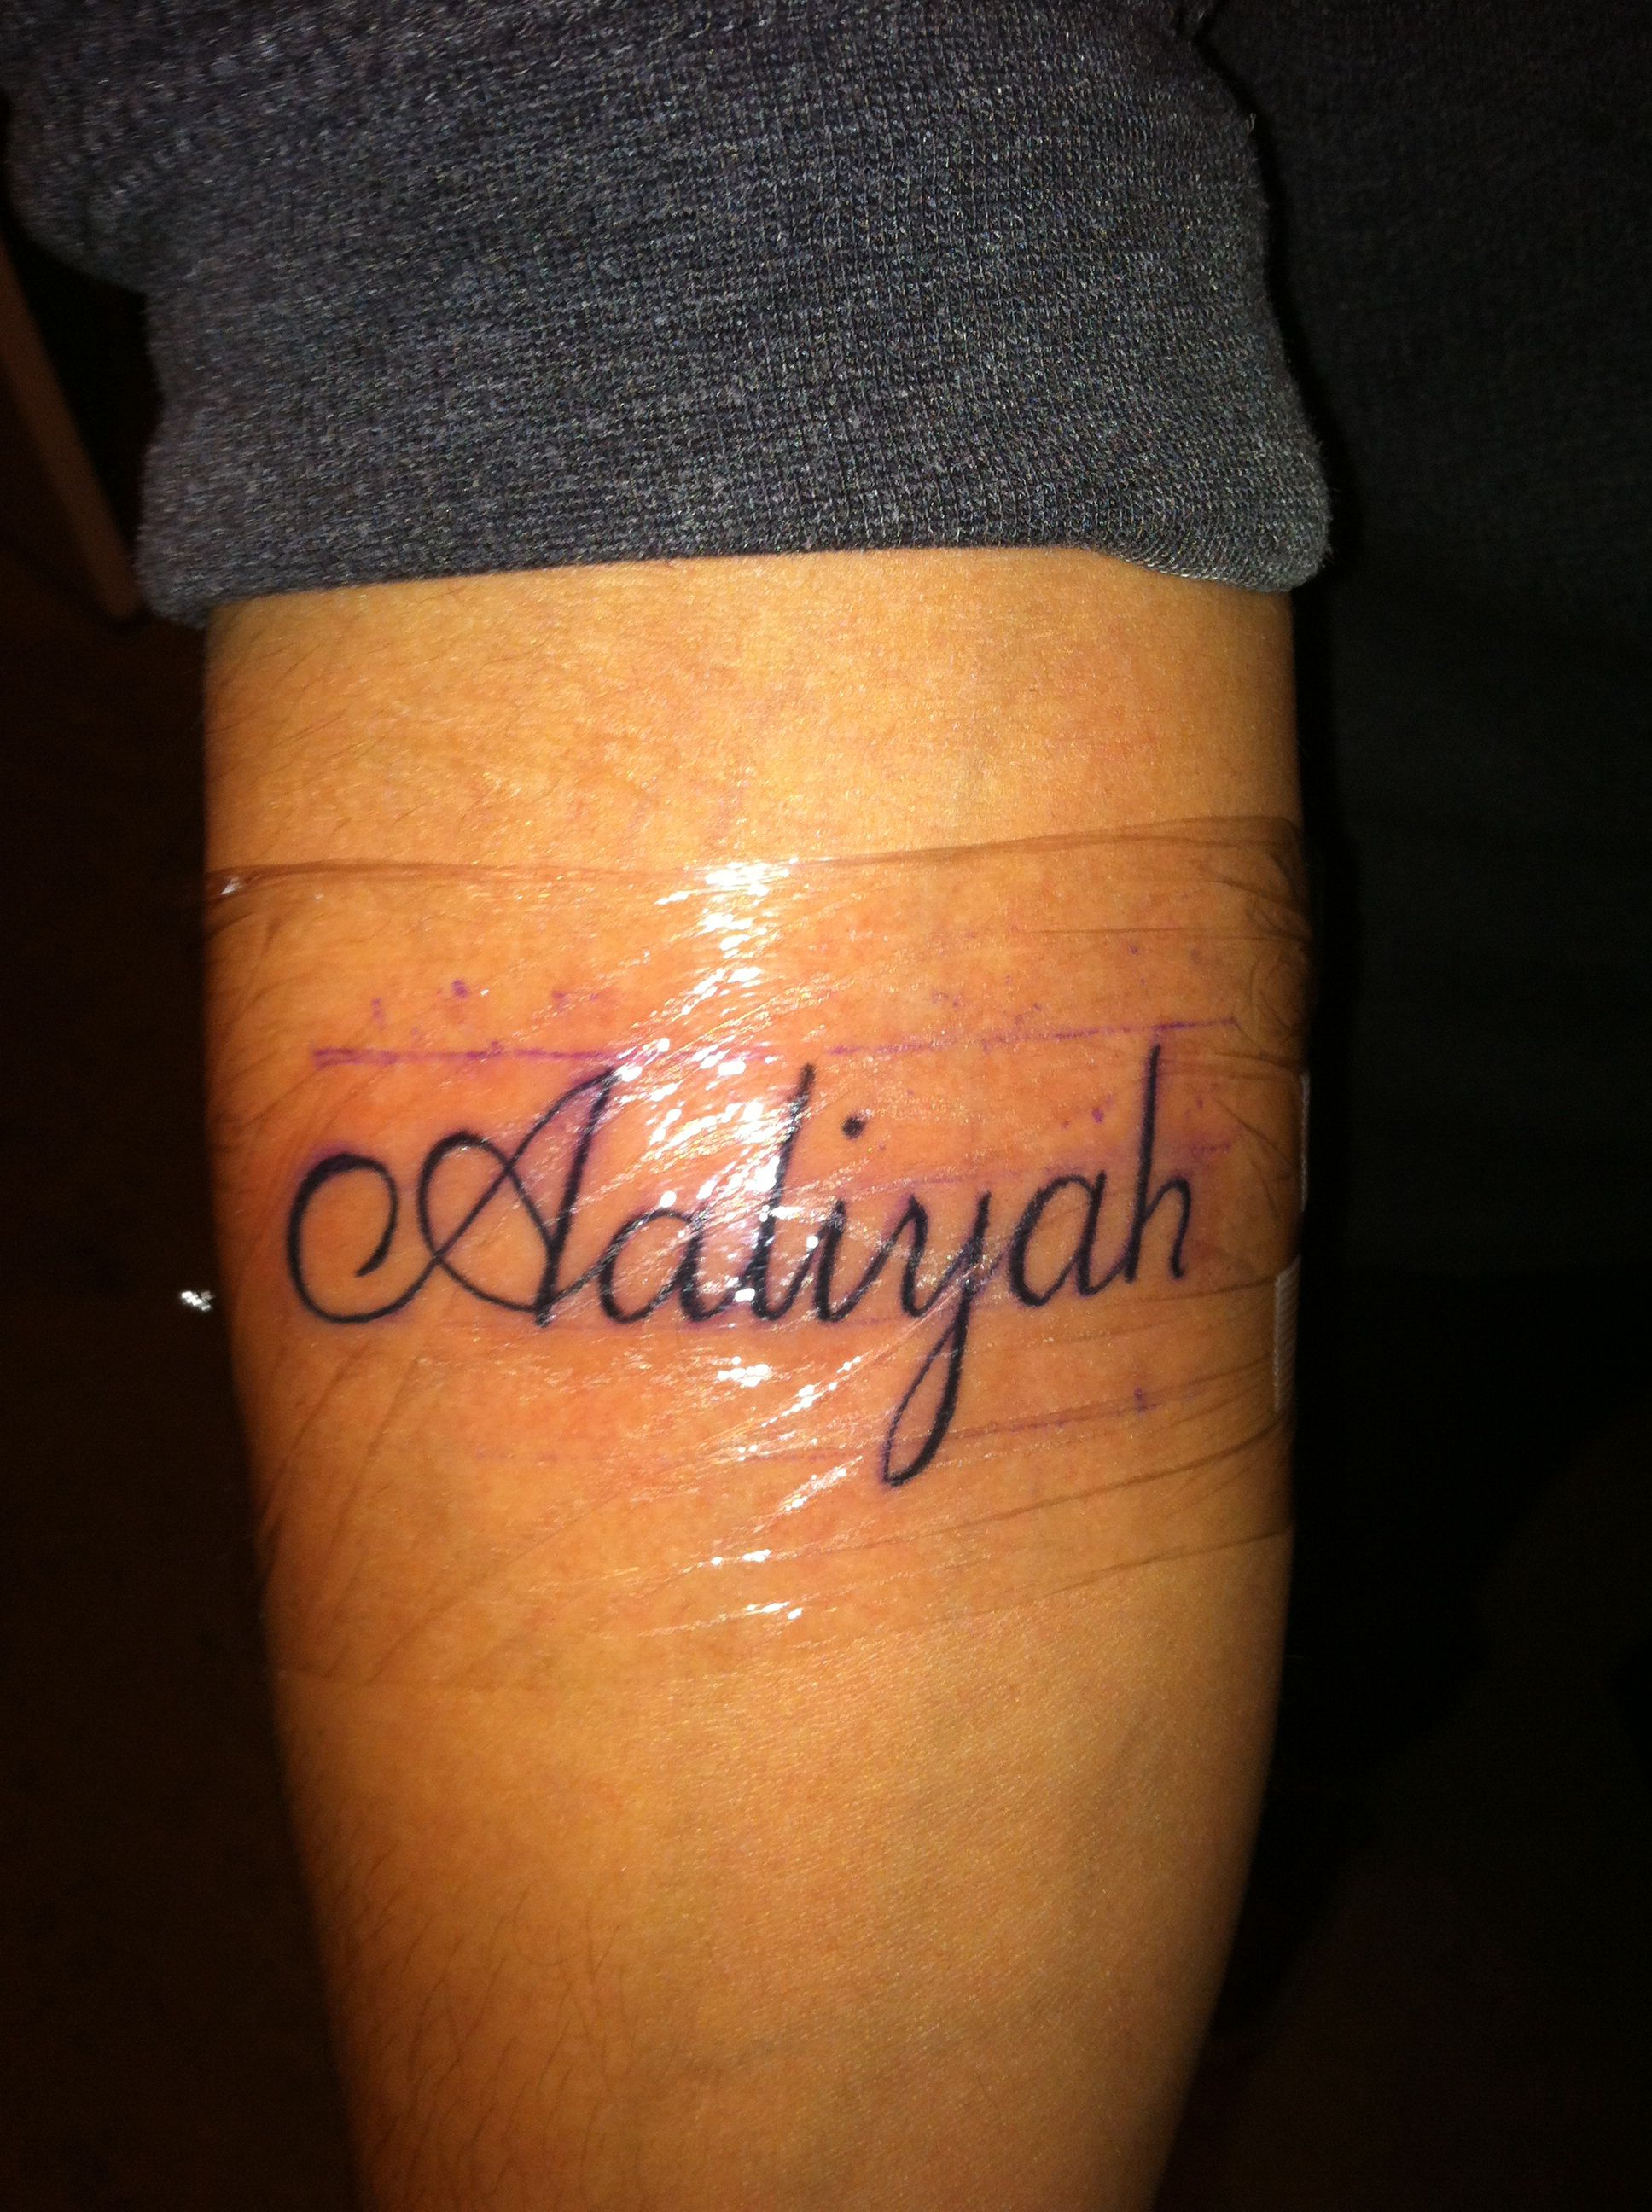 aaliyah tattoos pinterest aaliyah tattoo and tattoo designs. Black Bedroom Furniture Sets. Home Design Ideas